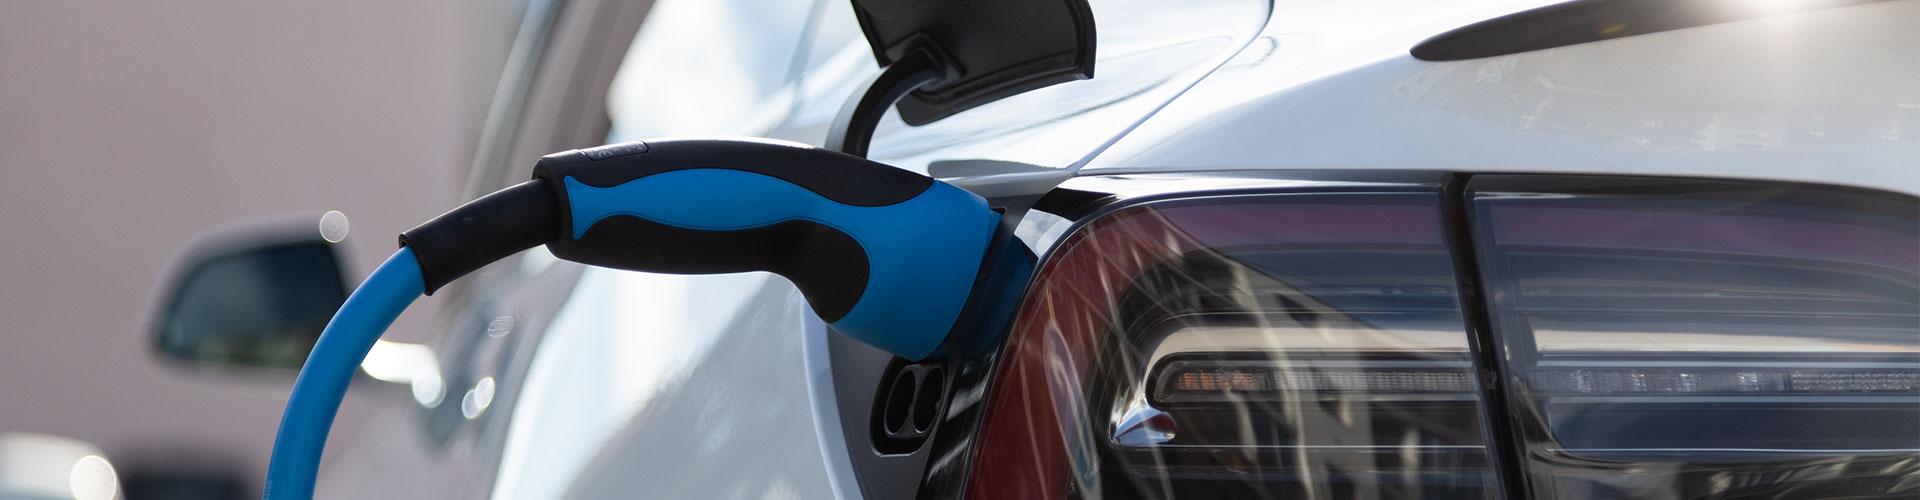 Das Zukunftsthema E-Autos – eine Analyse.